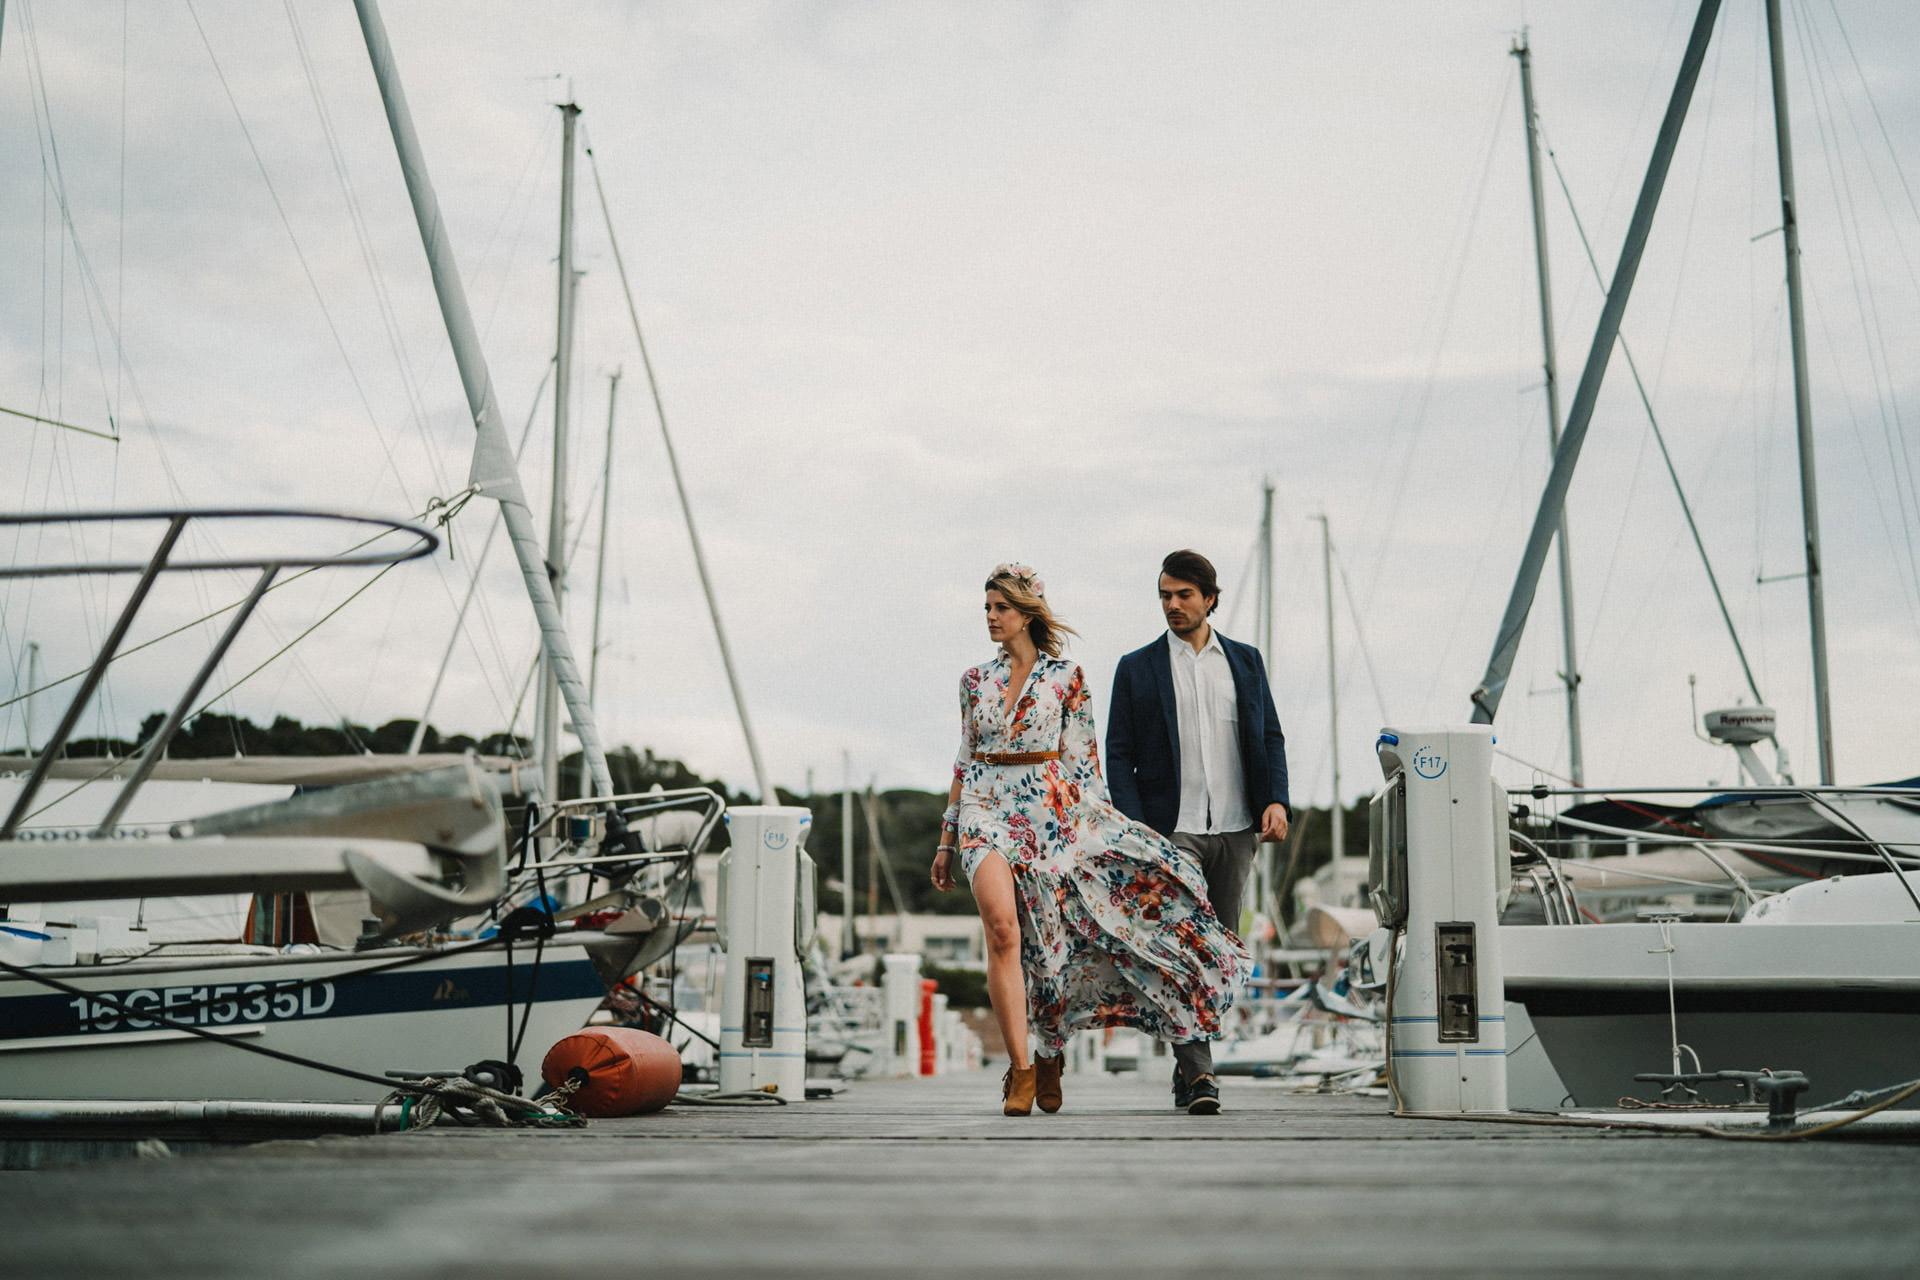 Wedding Styled Shoot, Wedding Style Shoot Over the Sea, Federico Pannacci, Federico Pannacci